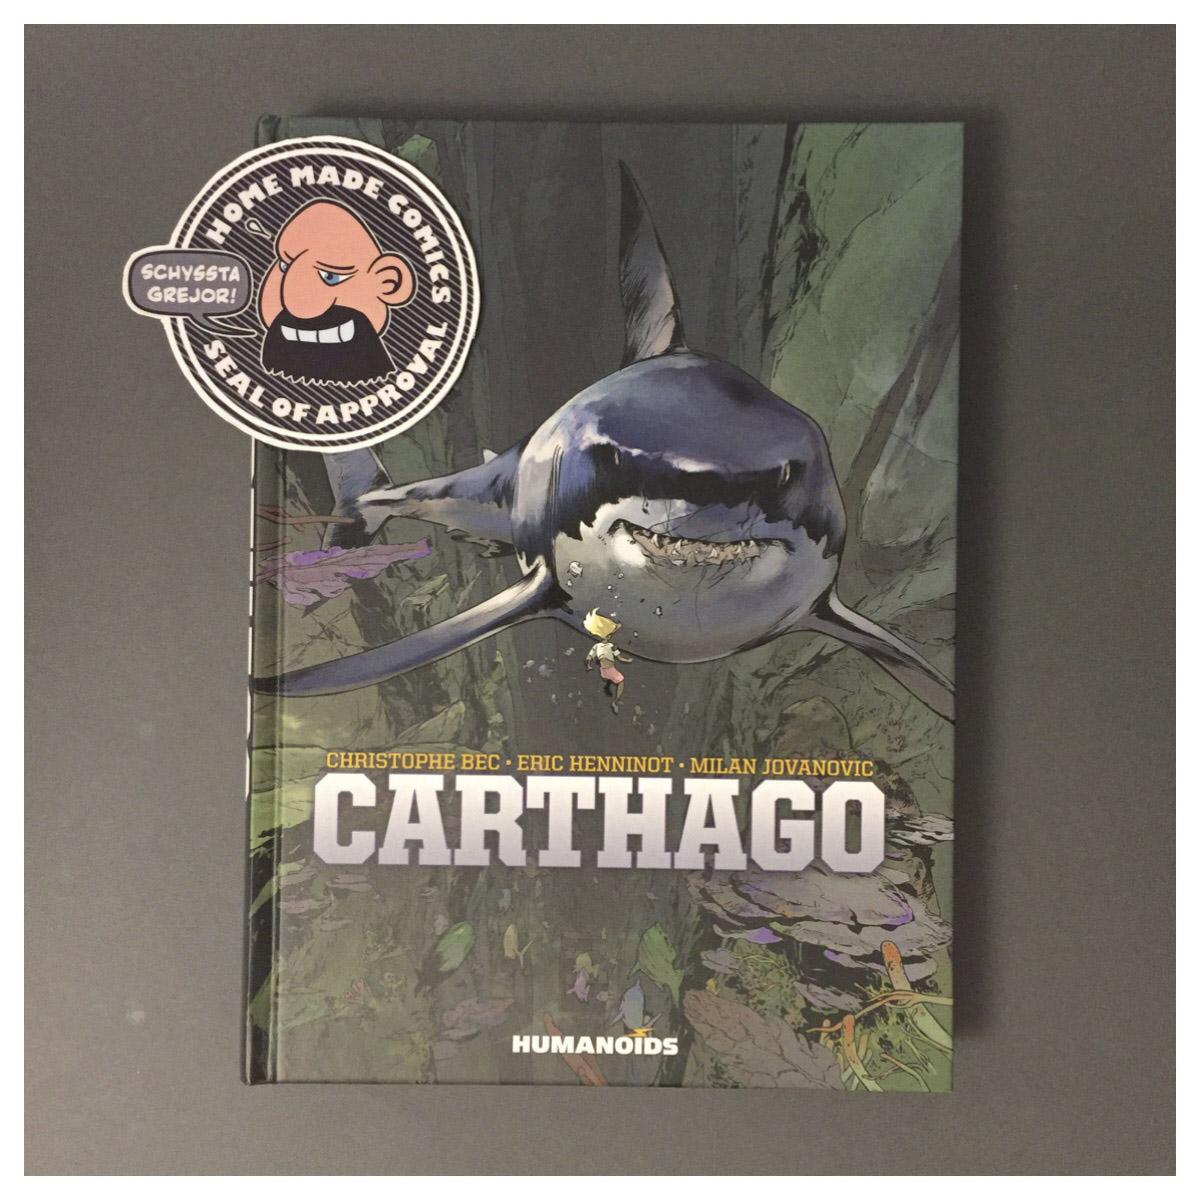 Home Made Comics Seal of Approval #228. Carthago av Christophe Bec, Eric Henninot, och Milan Jovanović utgiven av Humanoids5 2016.